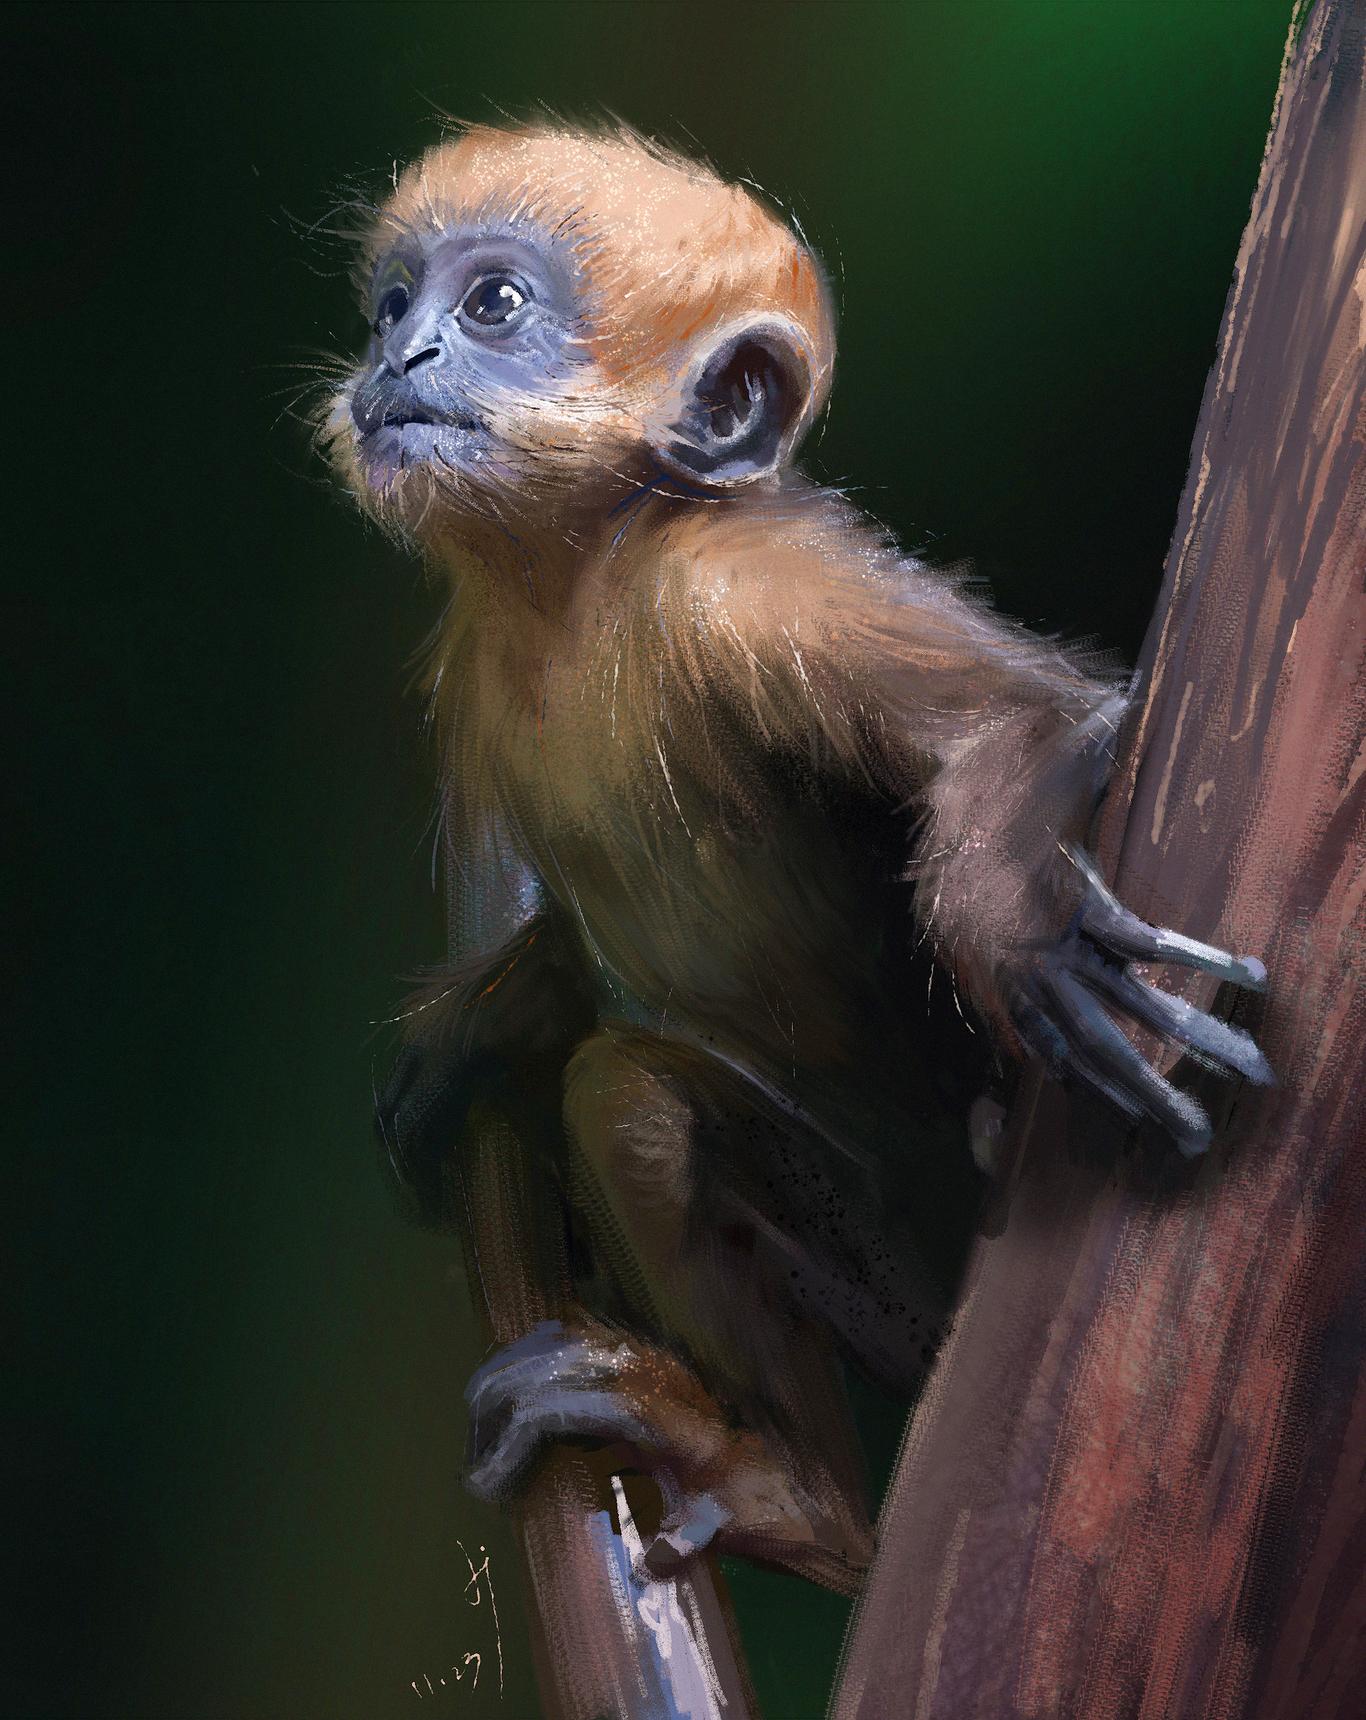 Fangxinyu monkey monkey 1 eae68d4b 8h4e